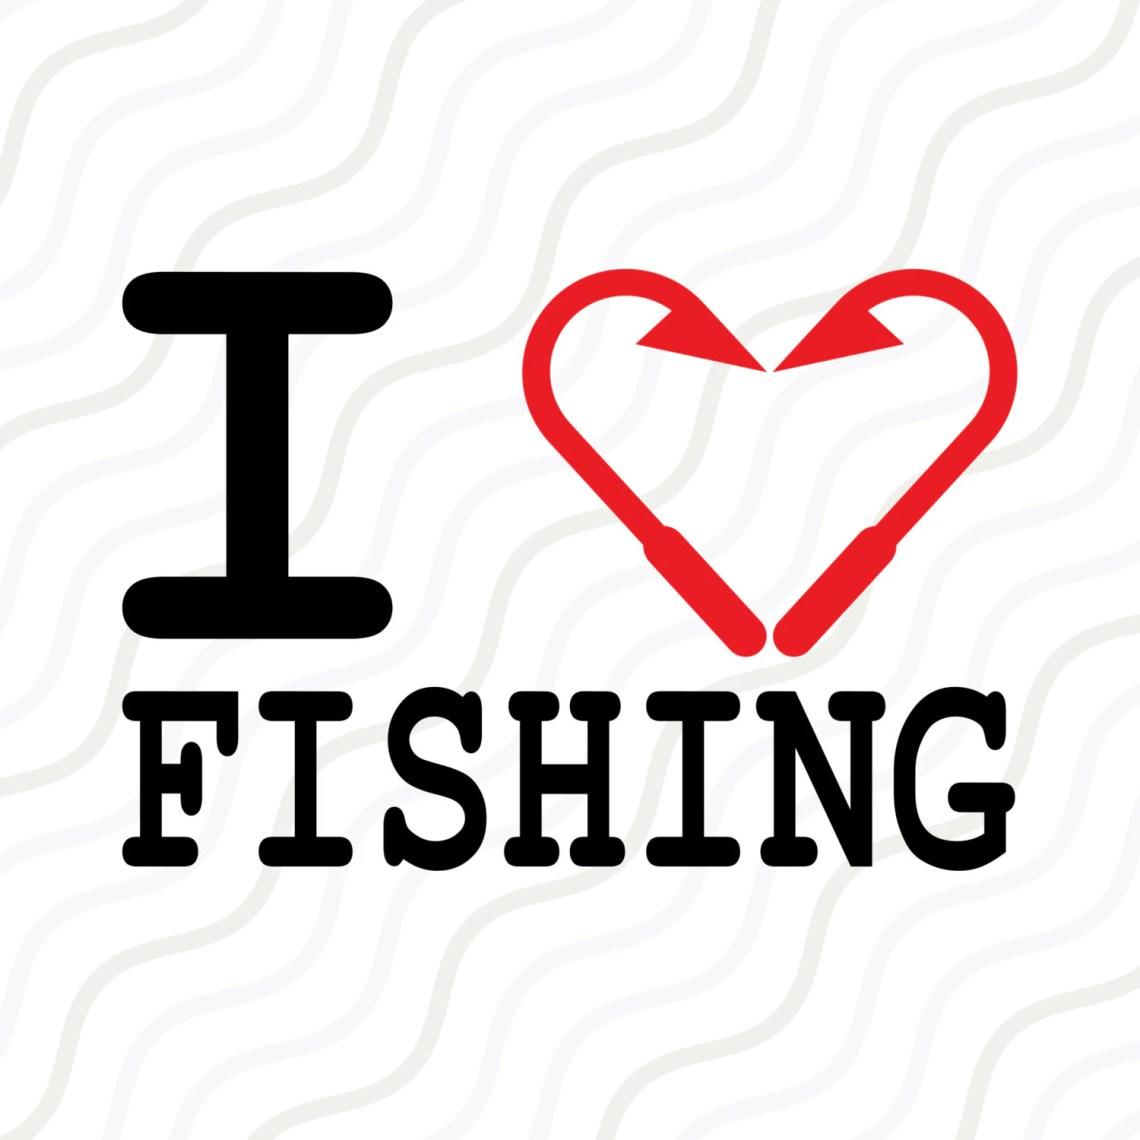 Download I Love Fishing SVG, Fish Hook SVG, Fishing SVG Cut table ...